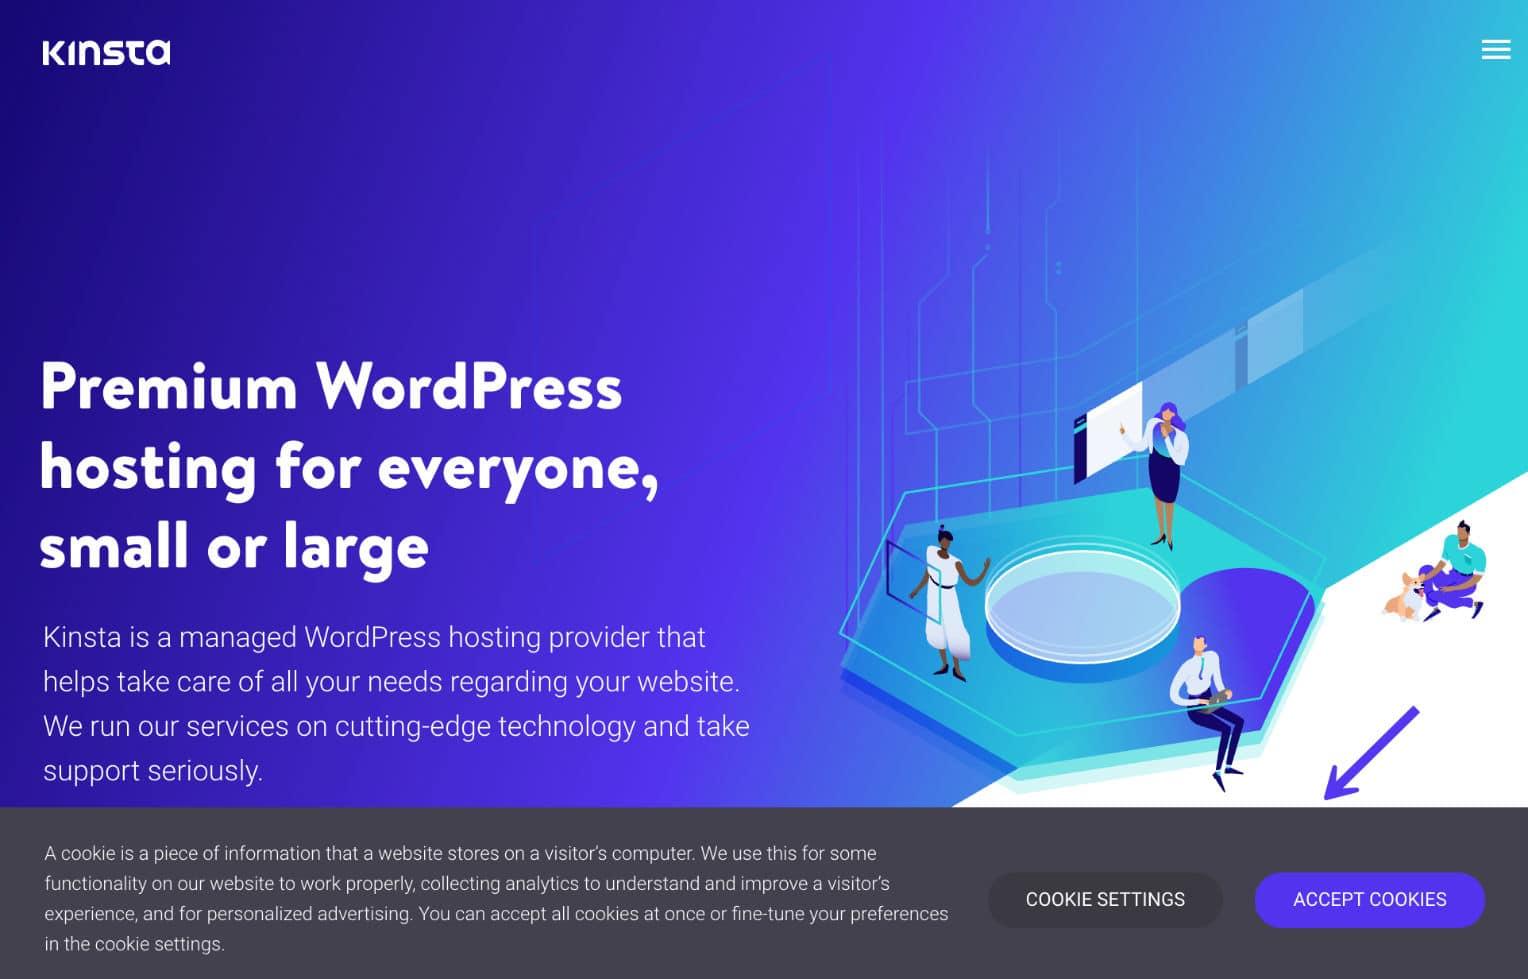 WordPressのカスタムクッキー同意プラグイン